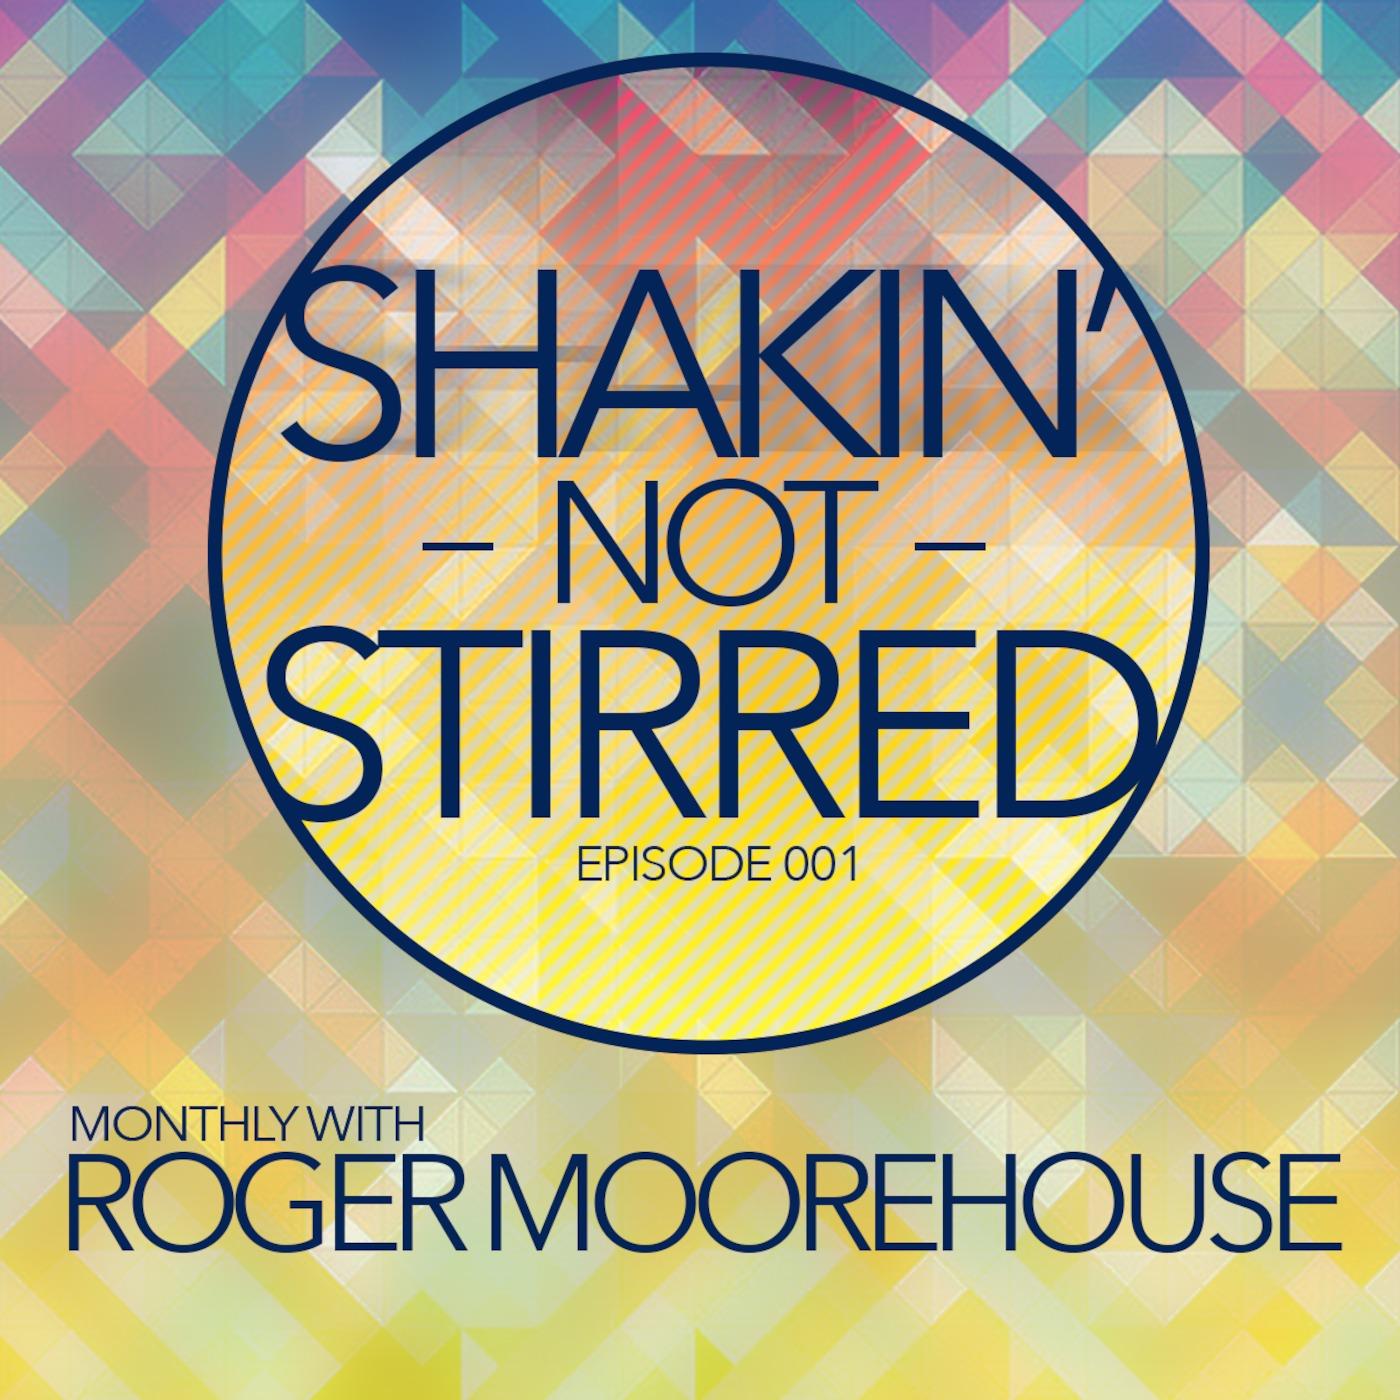 Shakin' Not Stirred